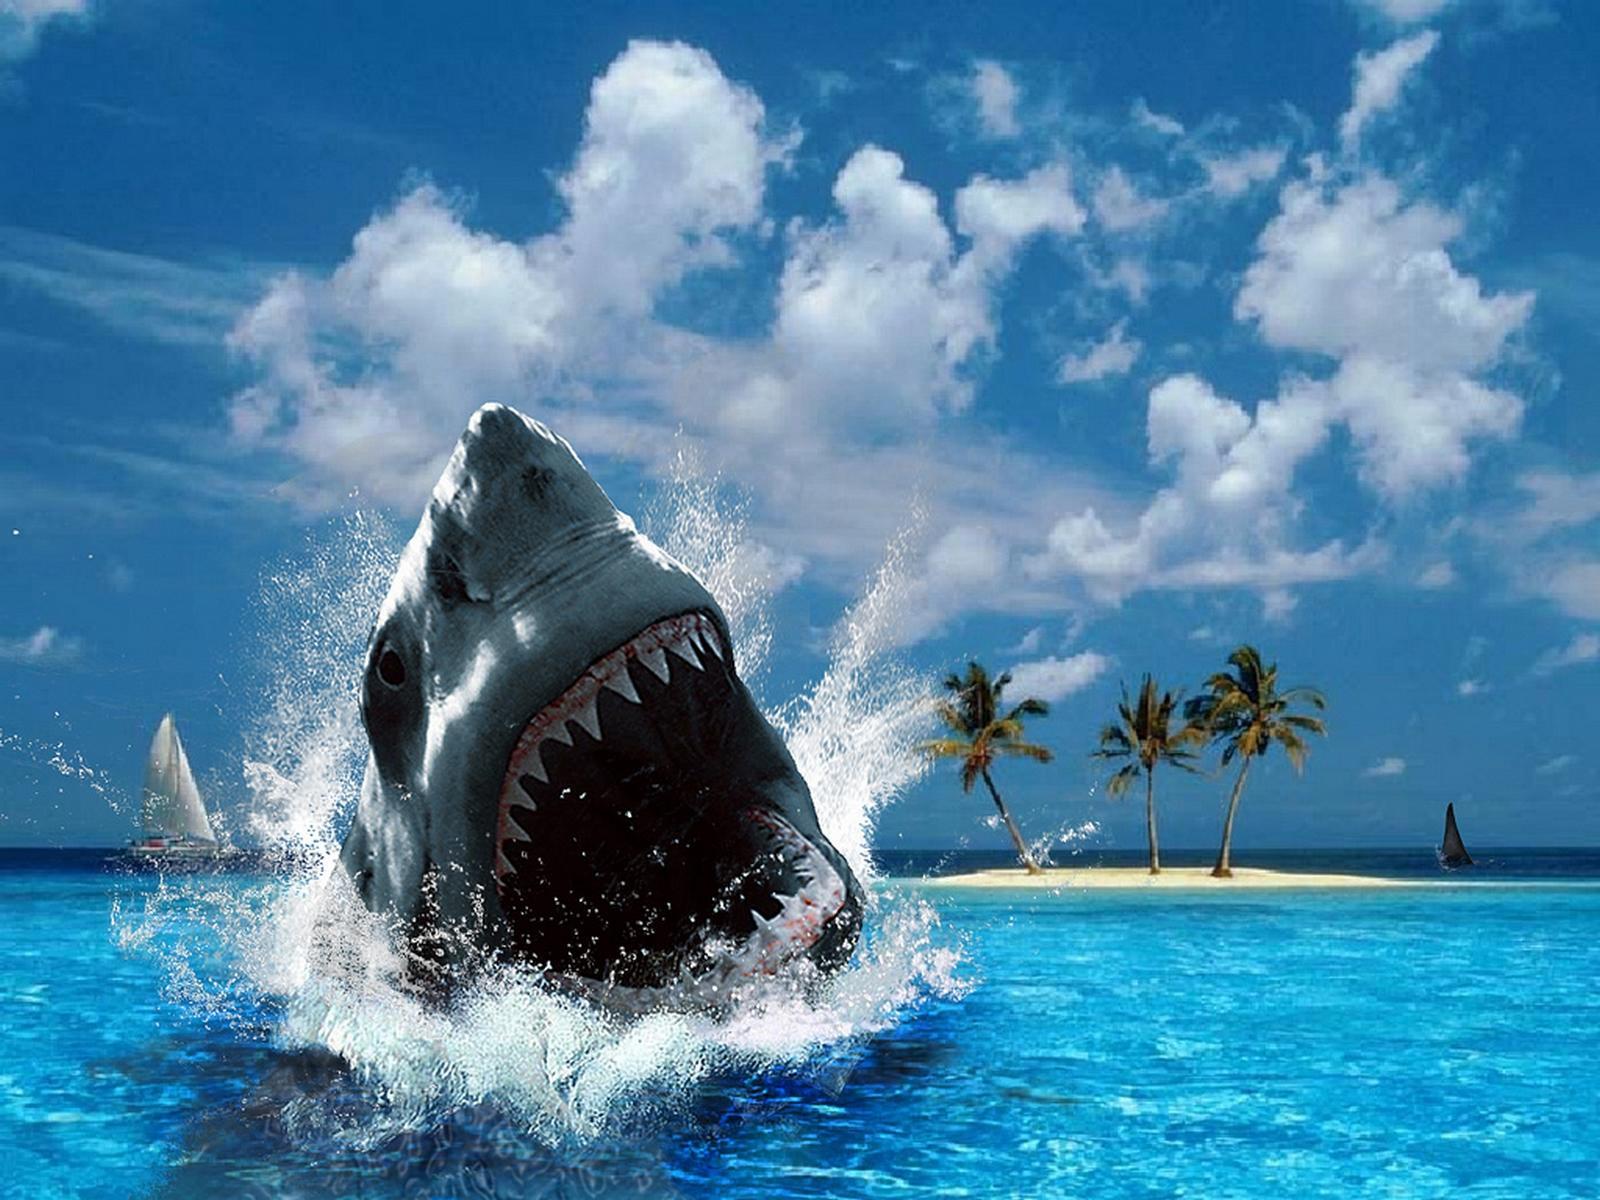 http://2.bp.blogspot.com/-4onOCIZhWbo/ToCwXEZds6I/AAAAAAAAAJs/Vy_LrGzlHxc/s1600/JAWS_Wallpaper_1600x1200_wallpaperhere.jpg